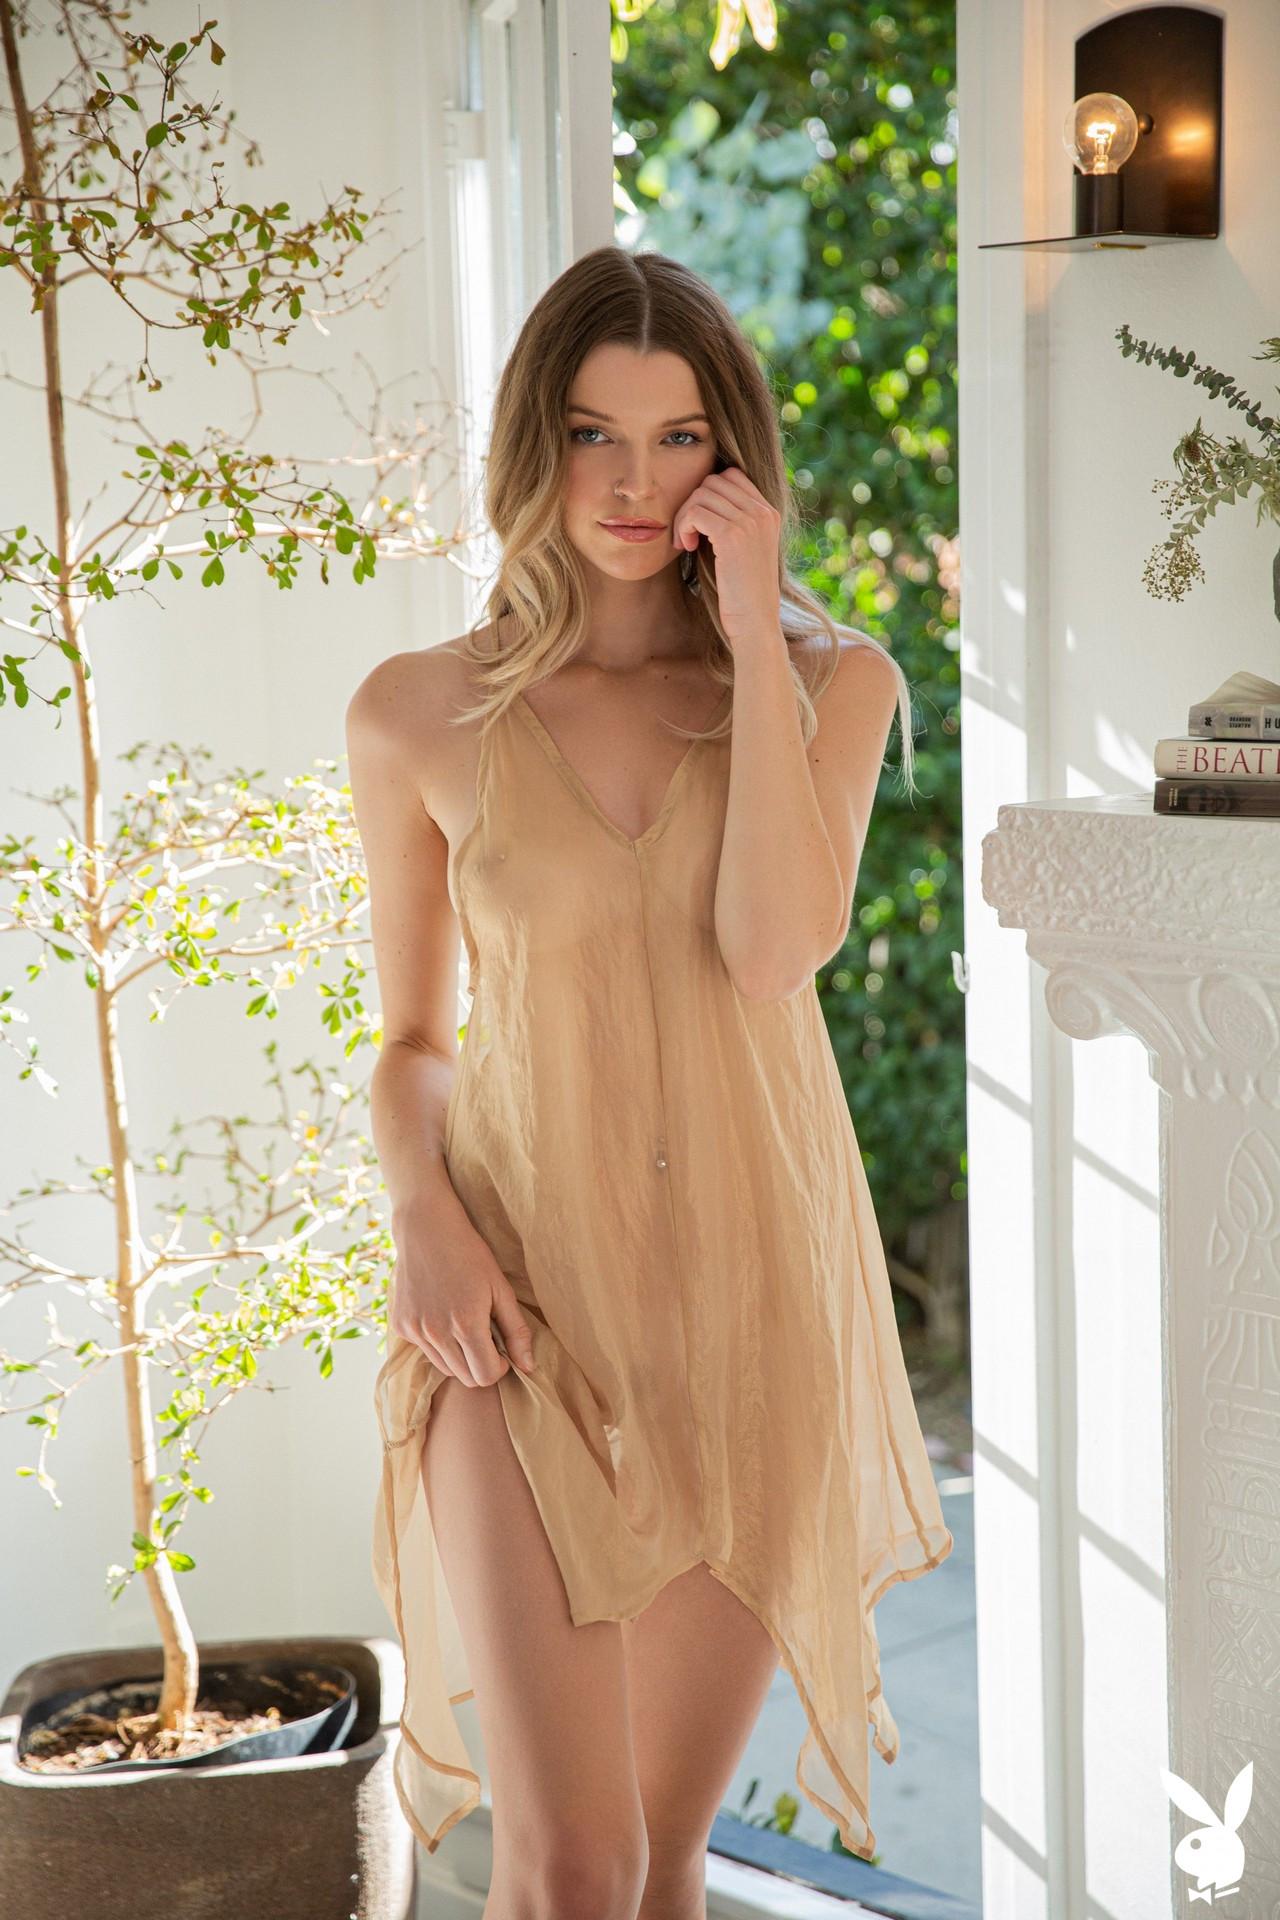 Brooke Lorraine In Simple Moments Playboy Plus (2)